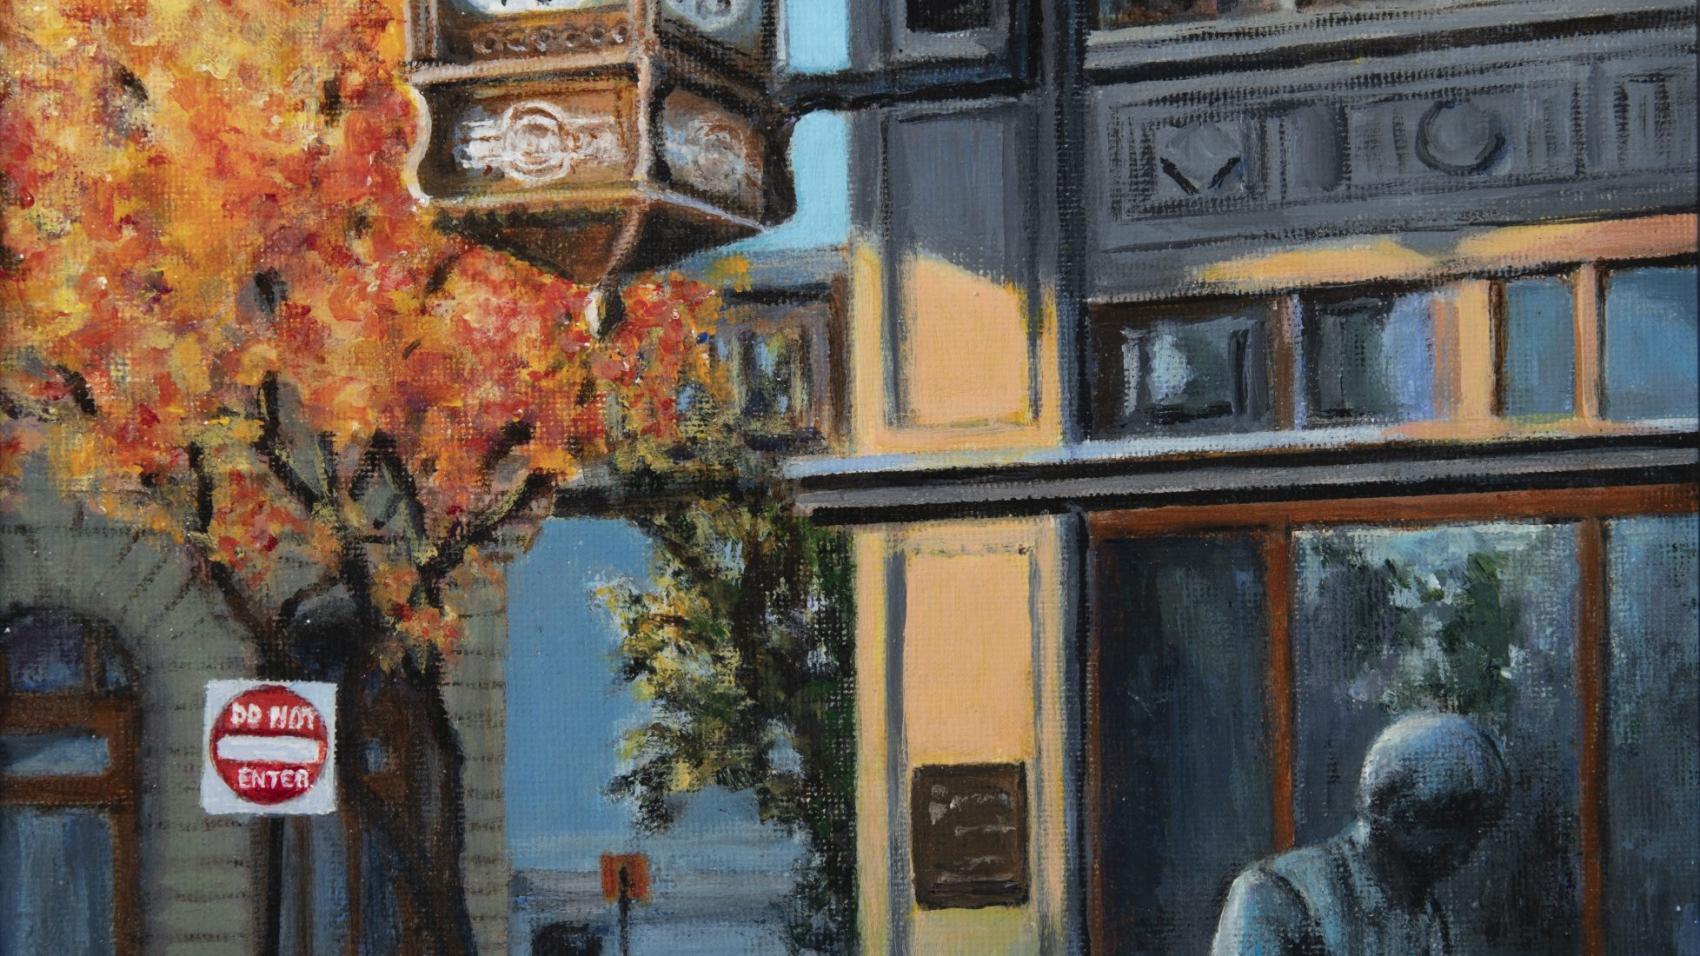 """6:30 Wichita"" by Nancy Luttrell, Wichita Presbyterian Manor"